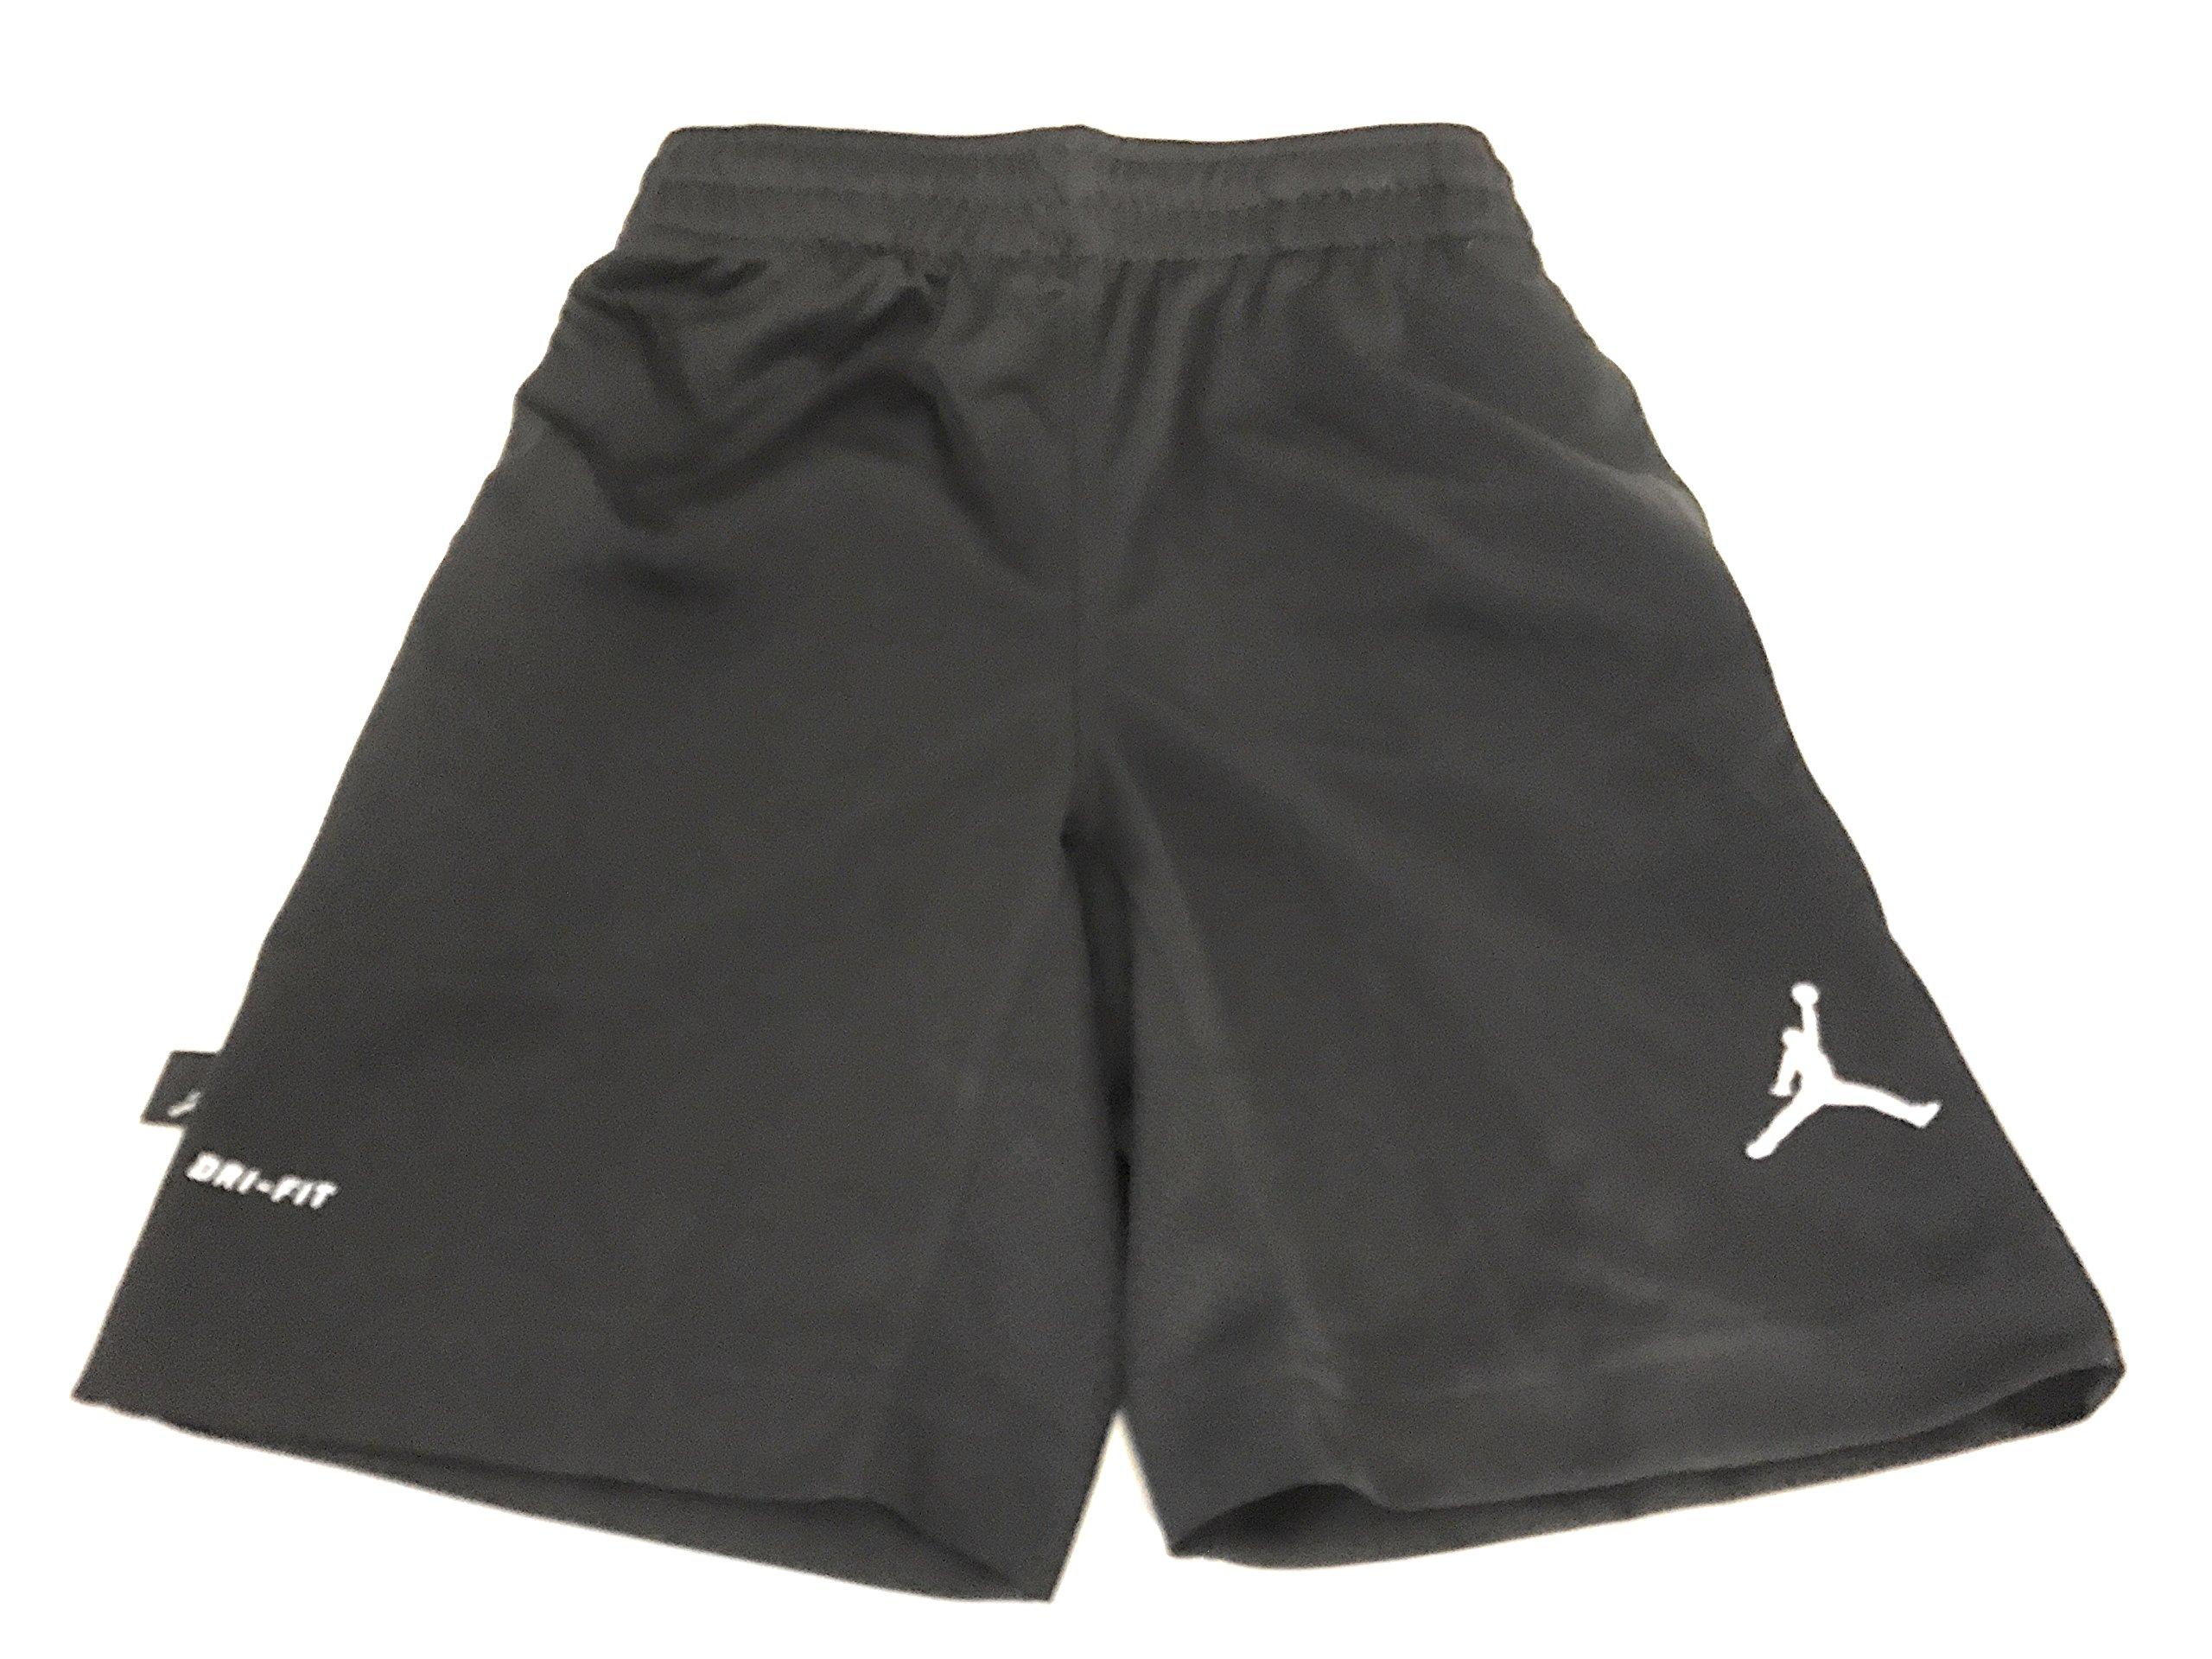 Jordan Boys Drifit Short Size 4 Black